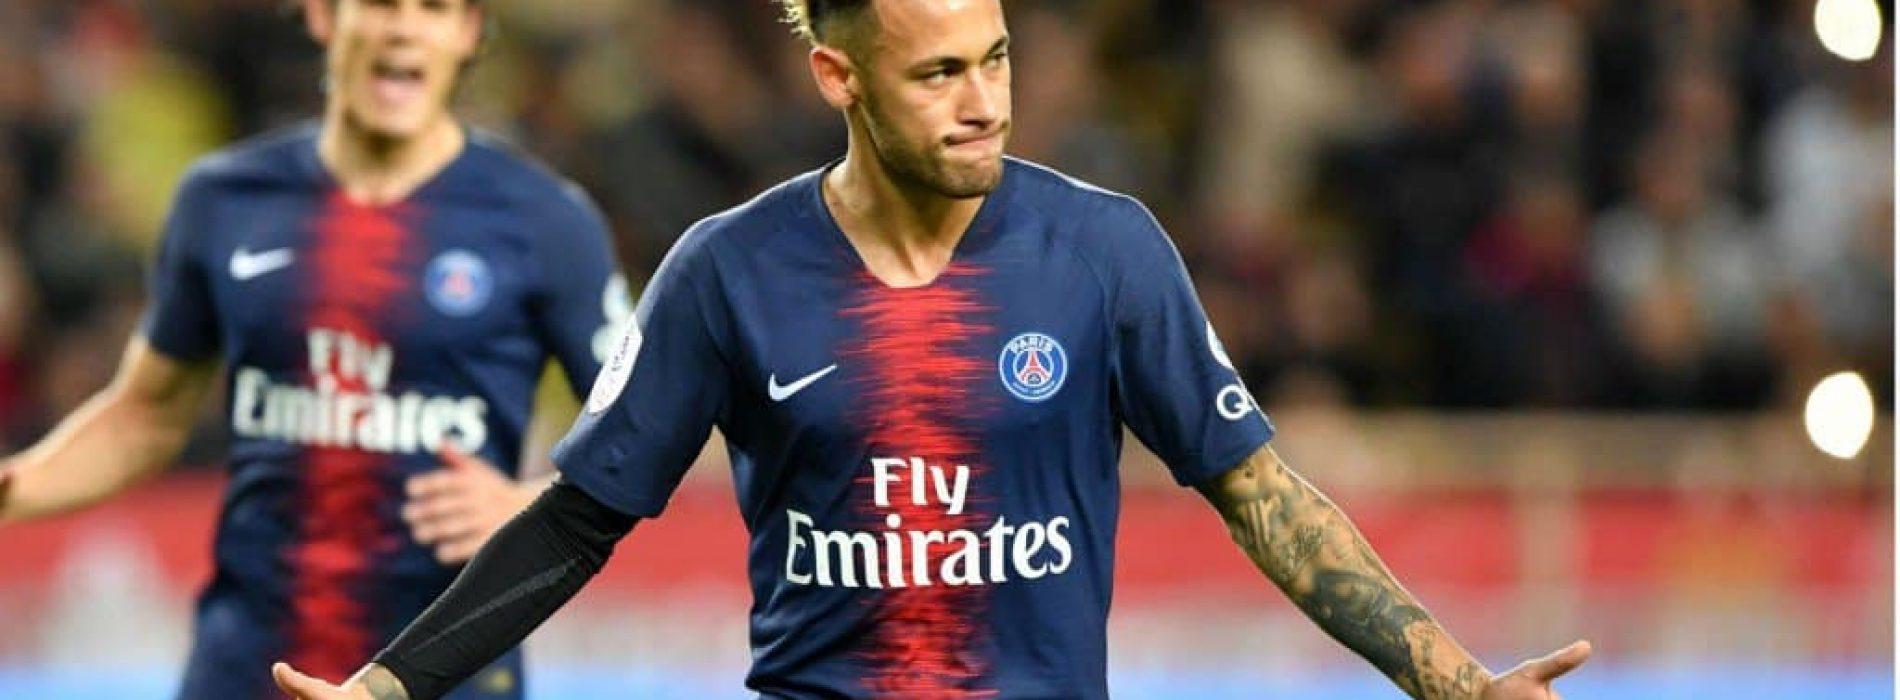 D'Oltremanica: Manchester United pronto a fare follie per Neymar